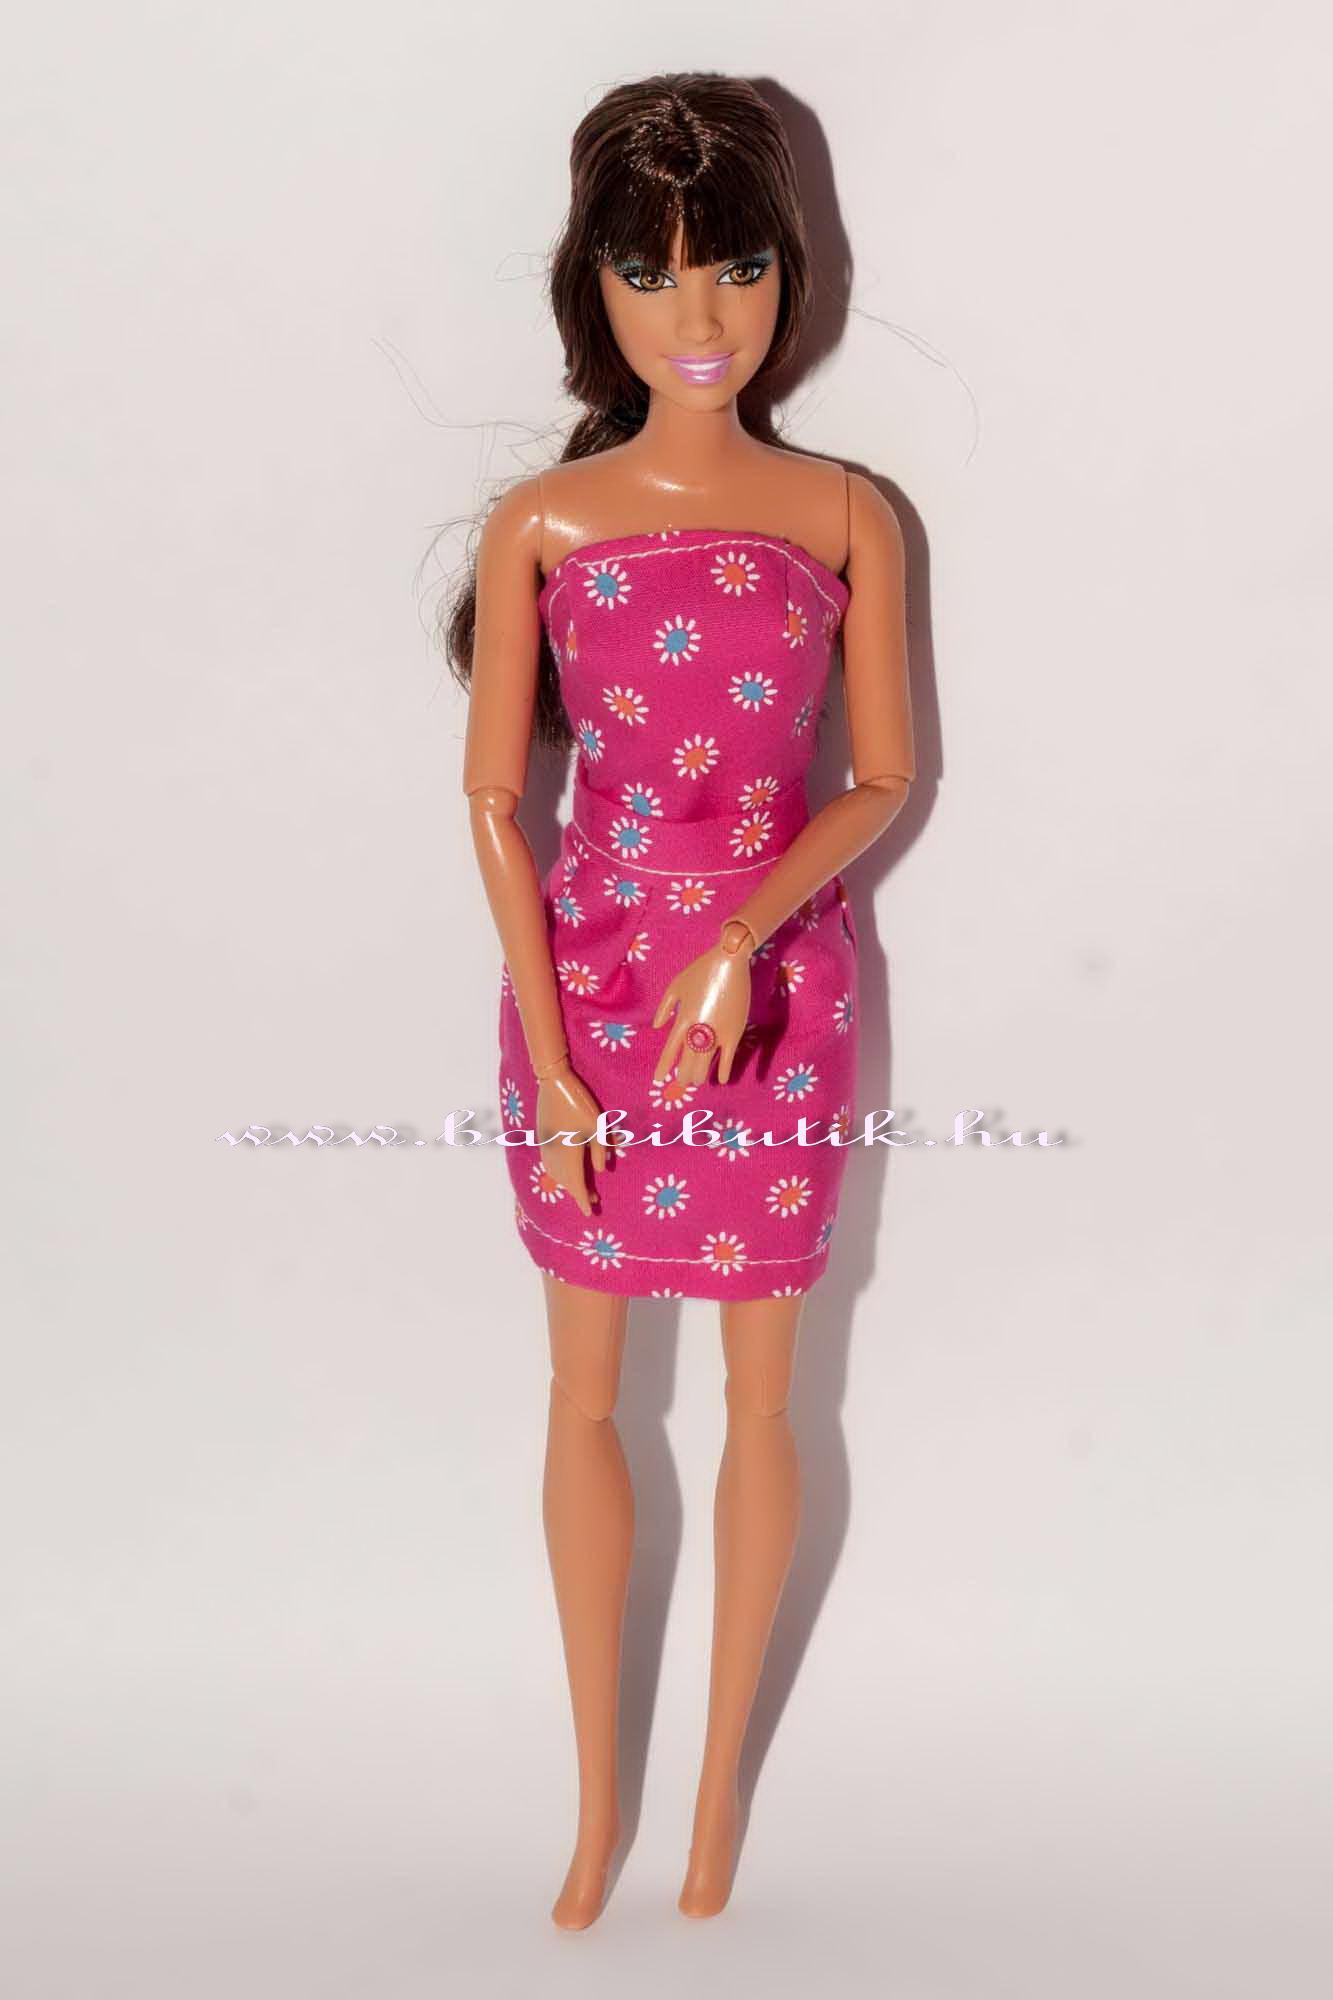 barbie ruha top szukitett szoknya